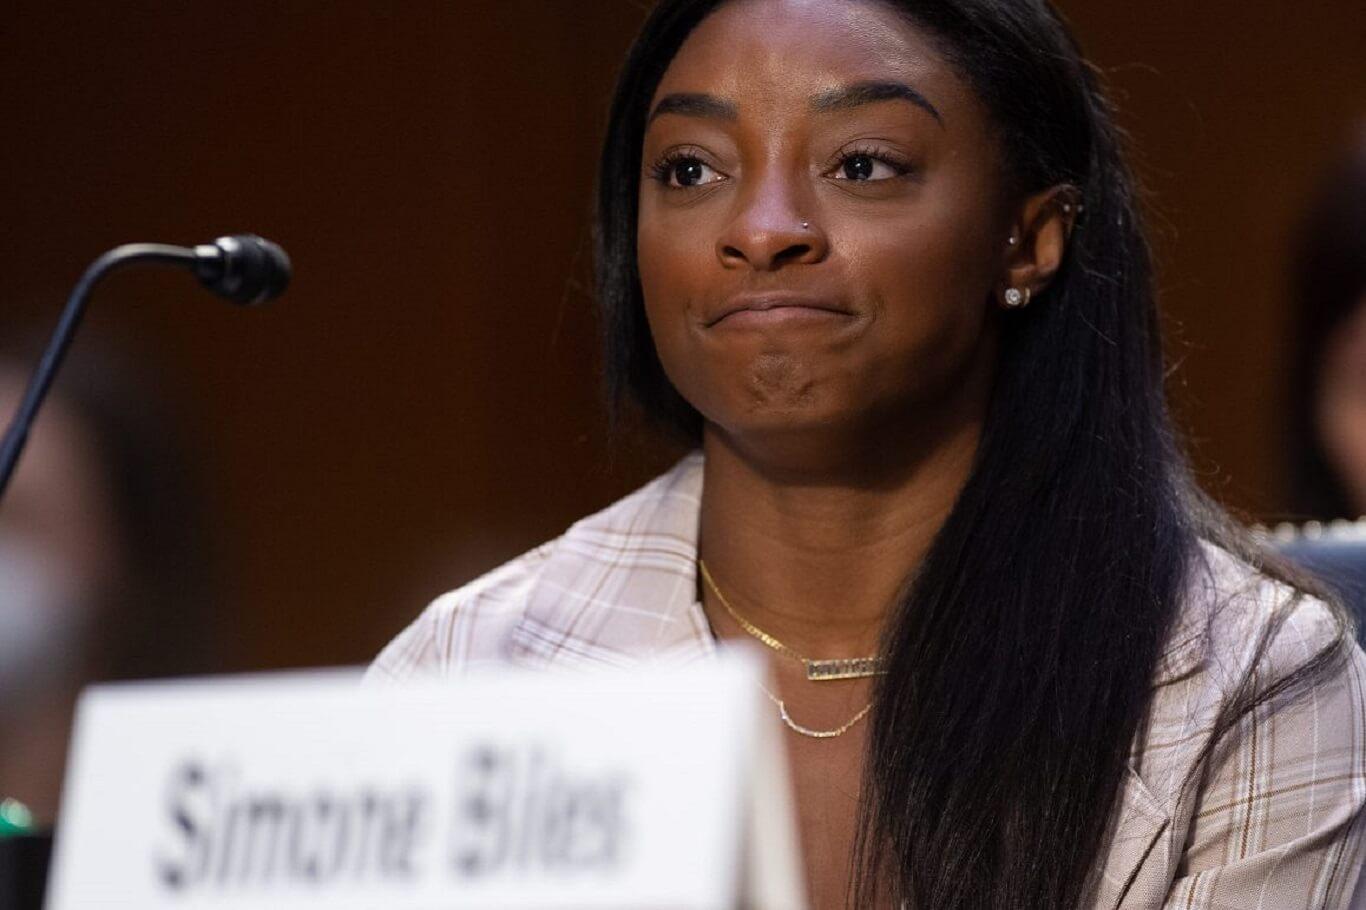 Simone Biles takes on disgraced Larry Nassar conviction